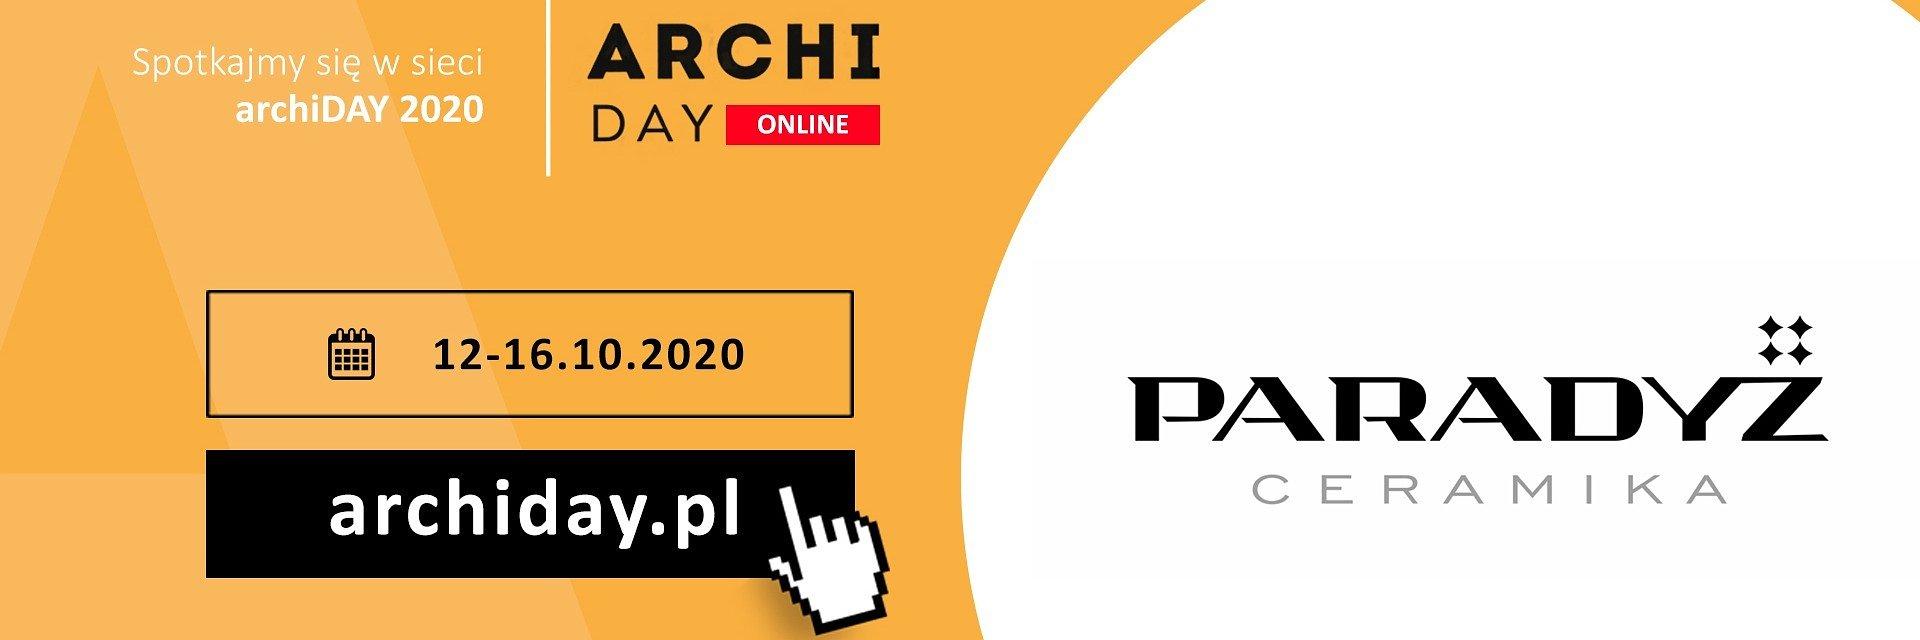 Ceramika Paradyż partnerem archiDAY 2020